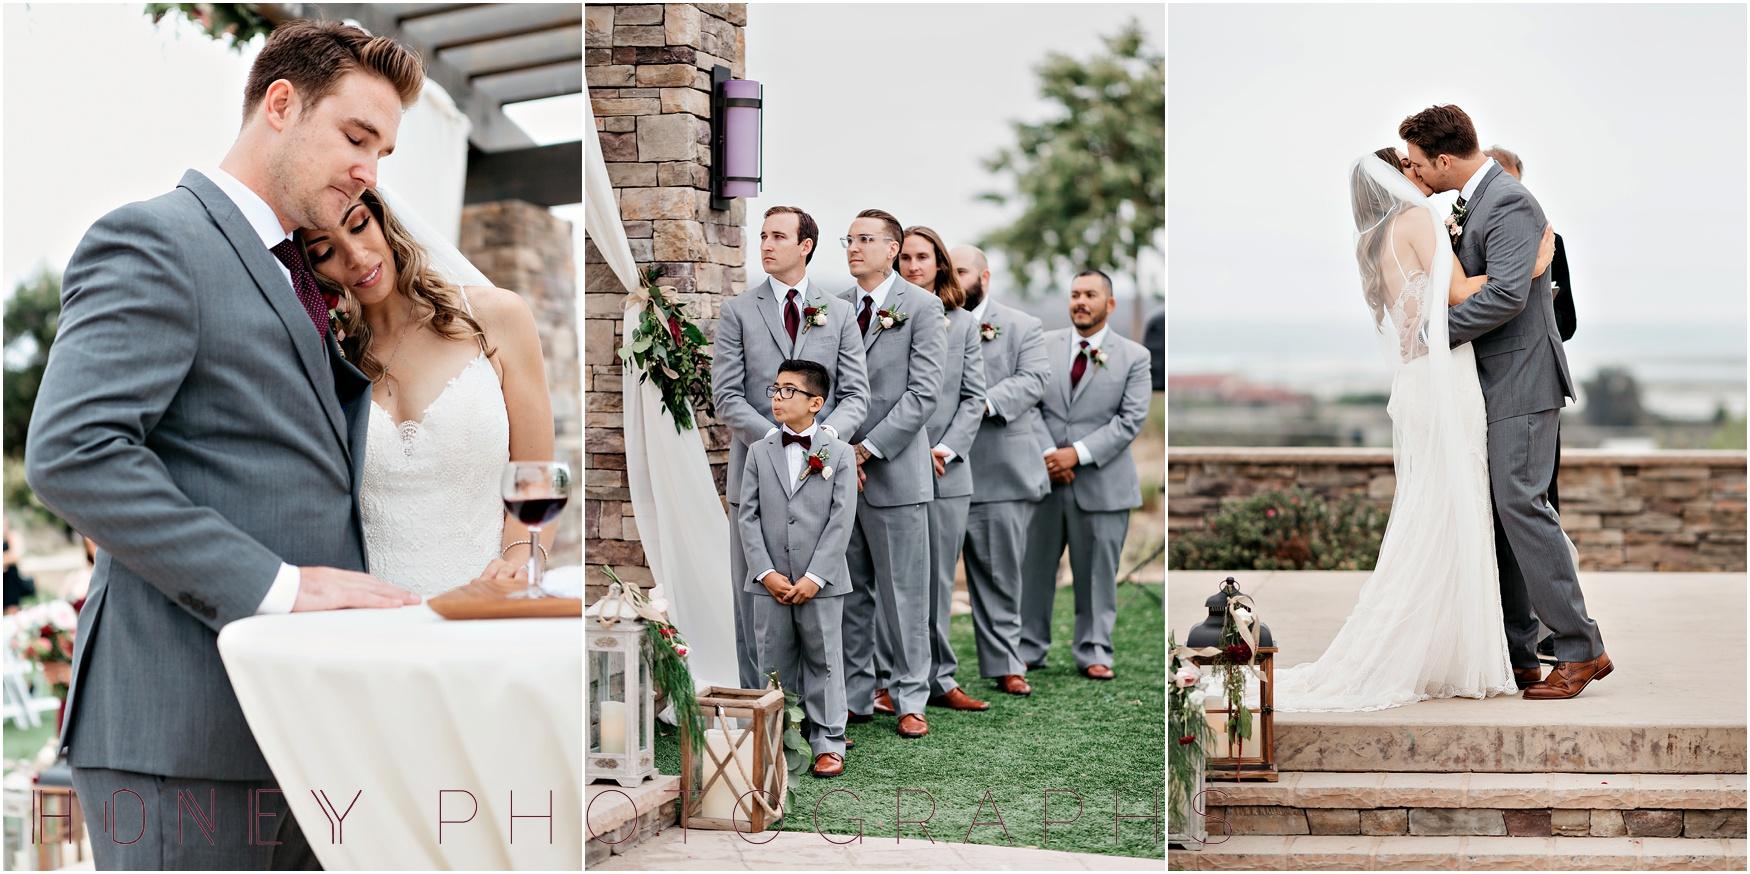 garden-classic-burgundy-jewel-tone-luxury-pacific-event-oceanside-wedding33.jpg